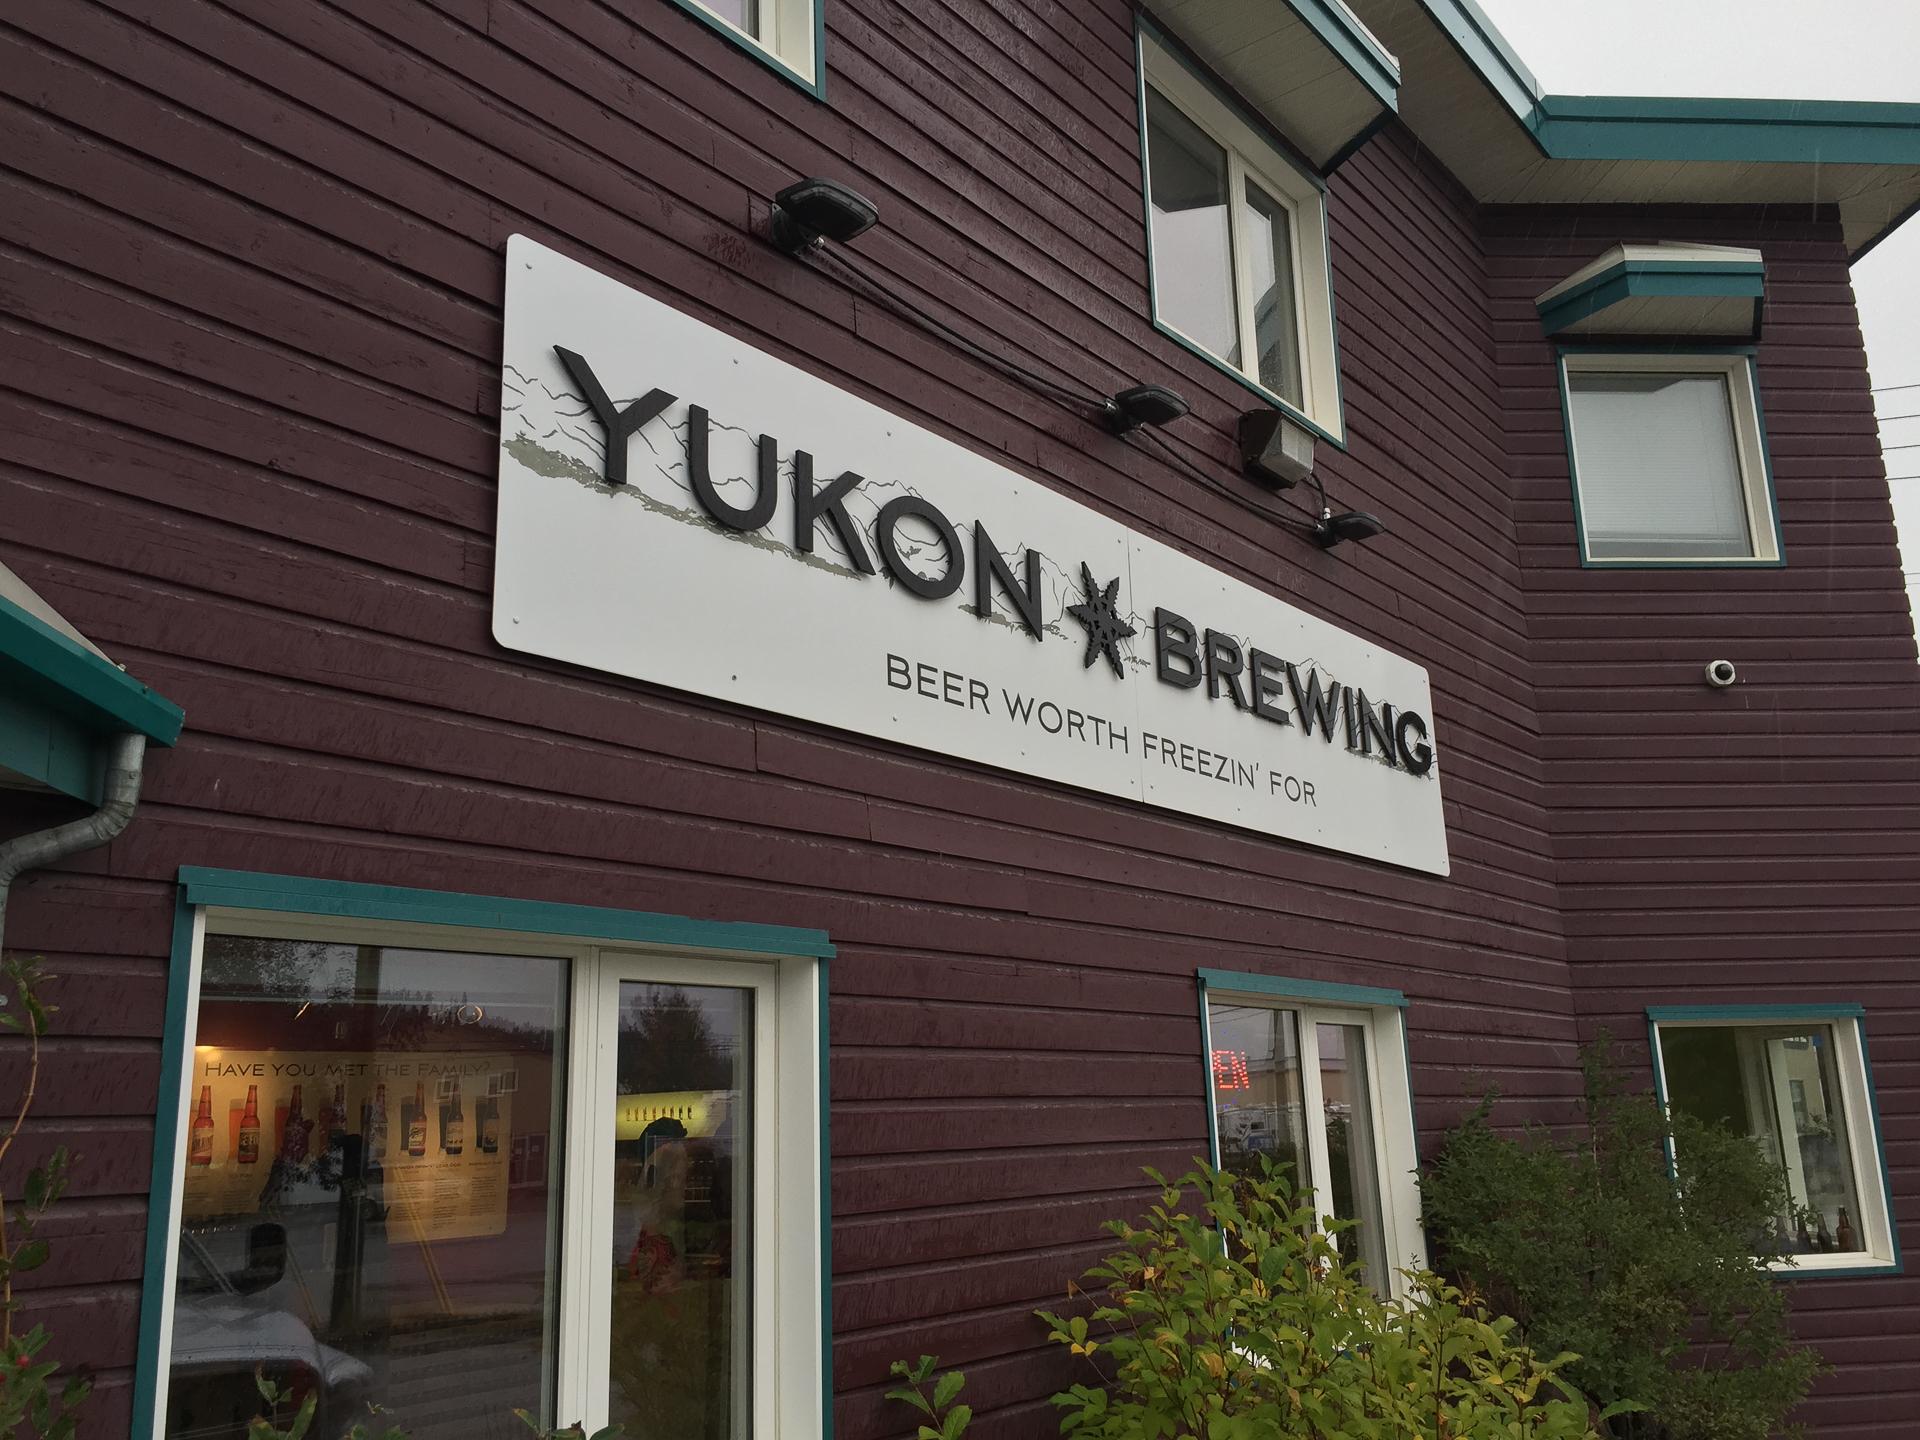 The iconic Yukon Brewing Company